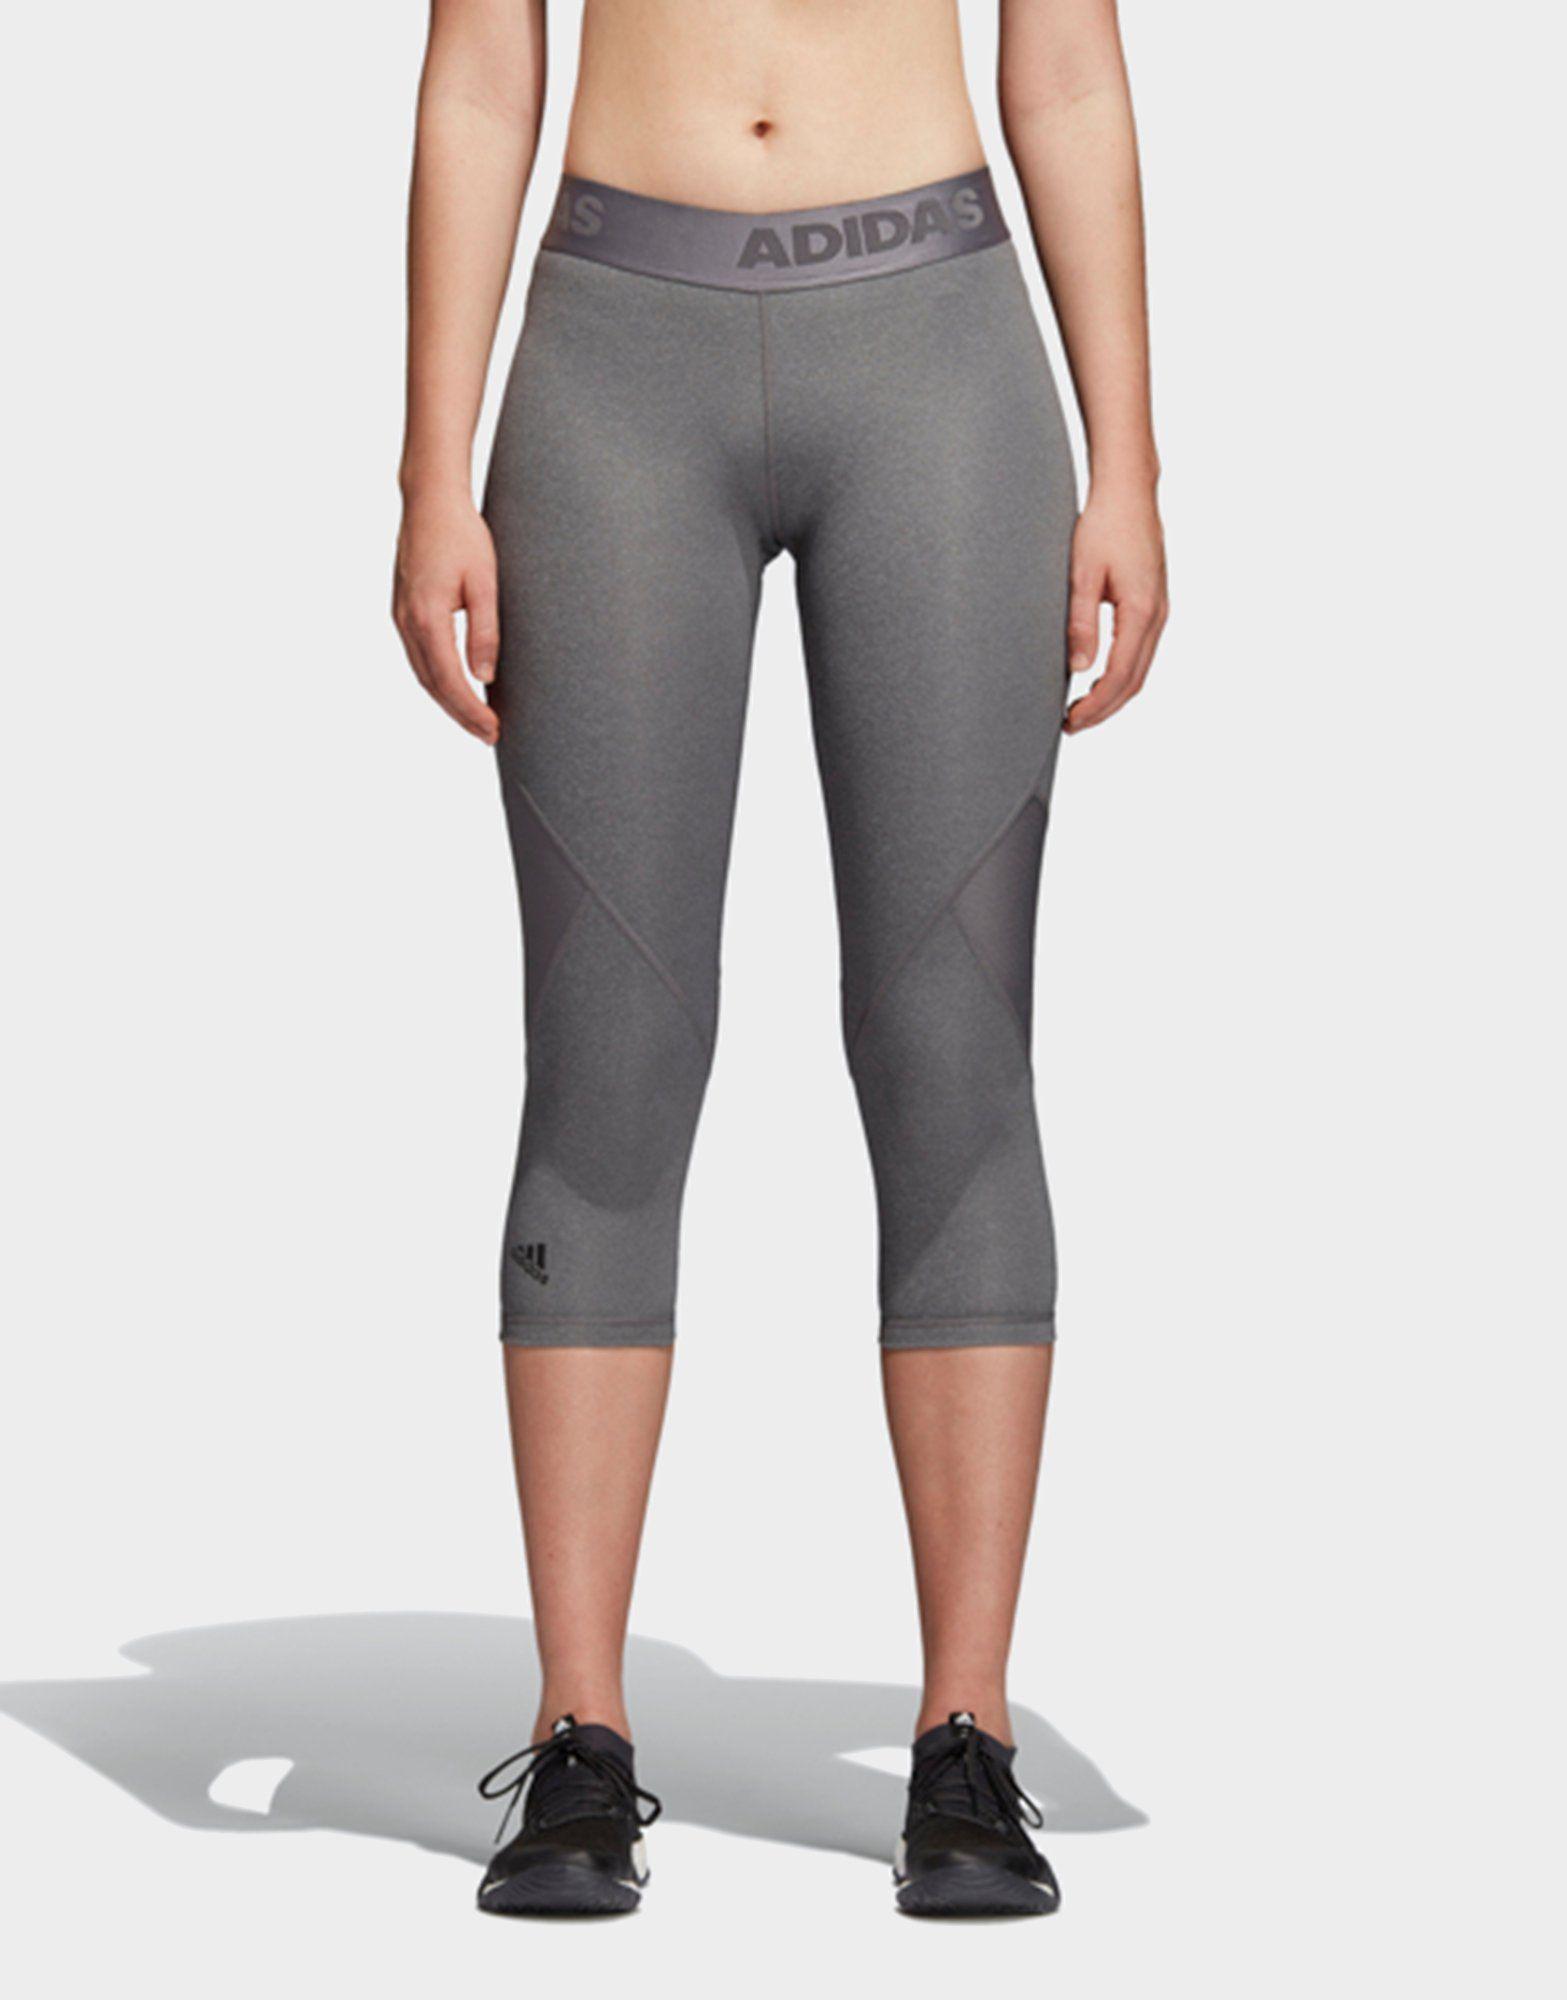 bb443f157c6c6 adidas Performance Alphaskin Sport Heather 3/4 Leggings | JD Sports